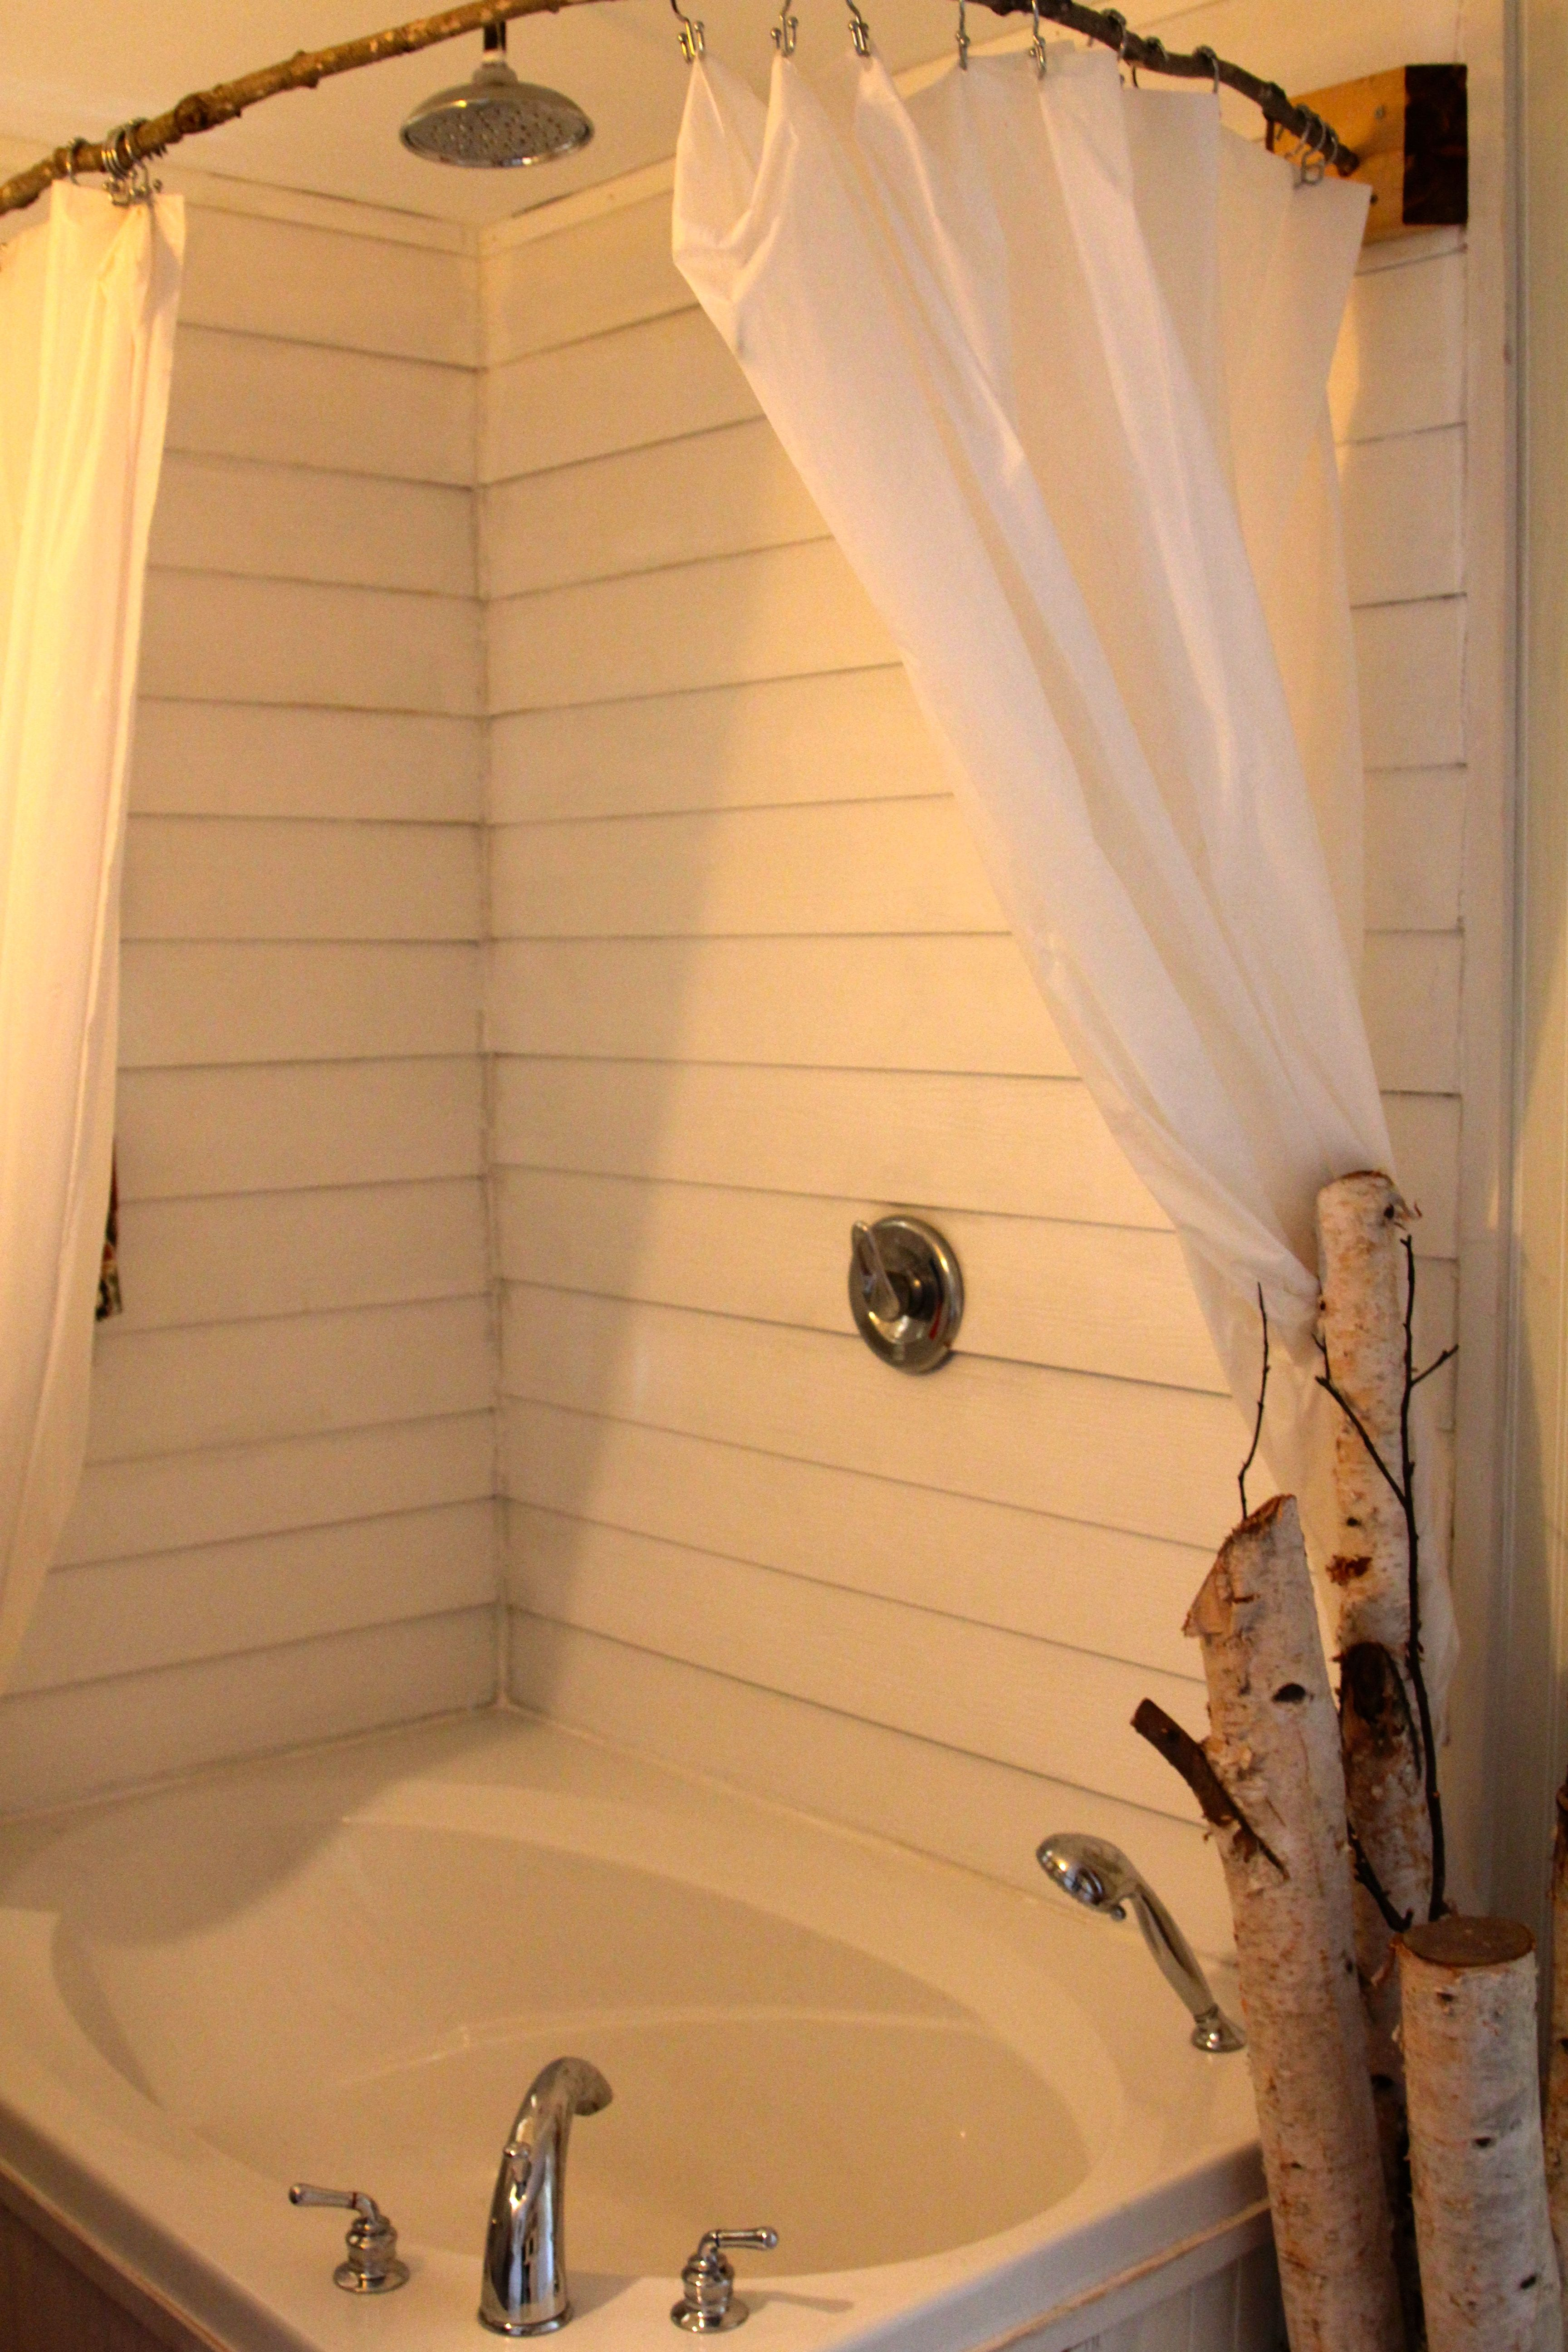 Using Hardi Plank Siding As Bath Surround Harvesting